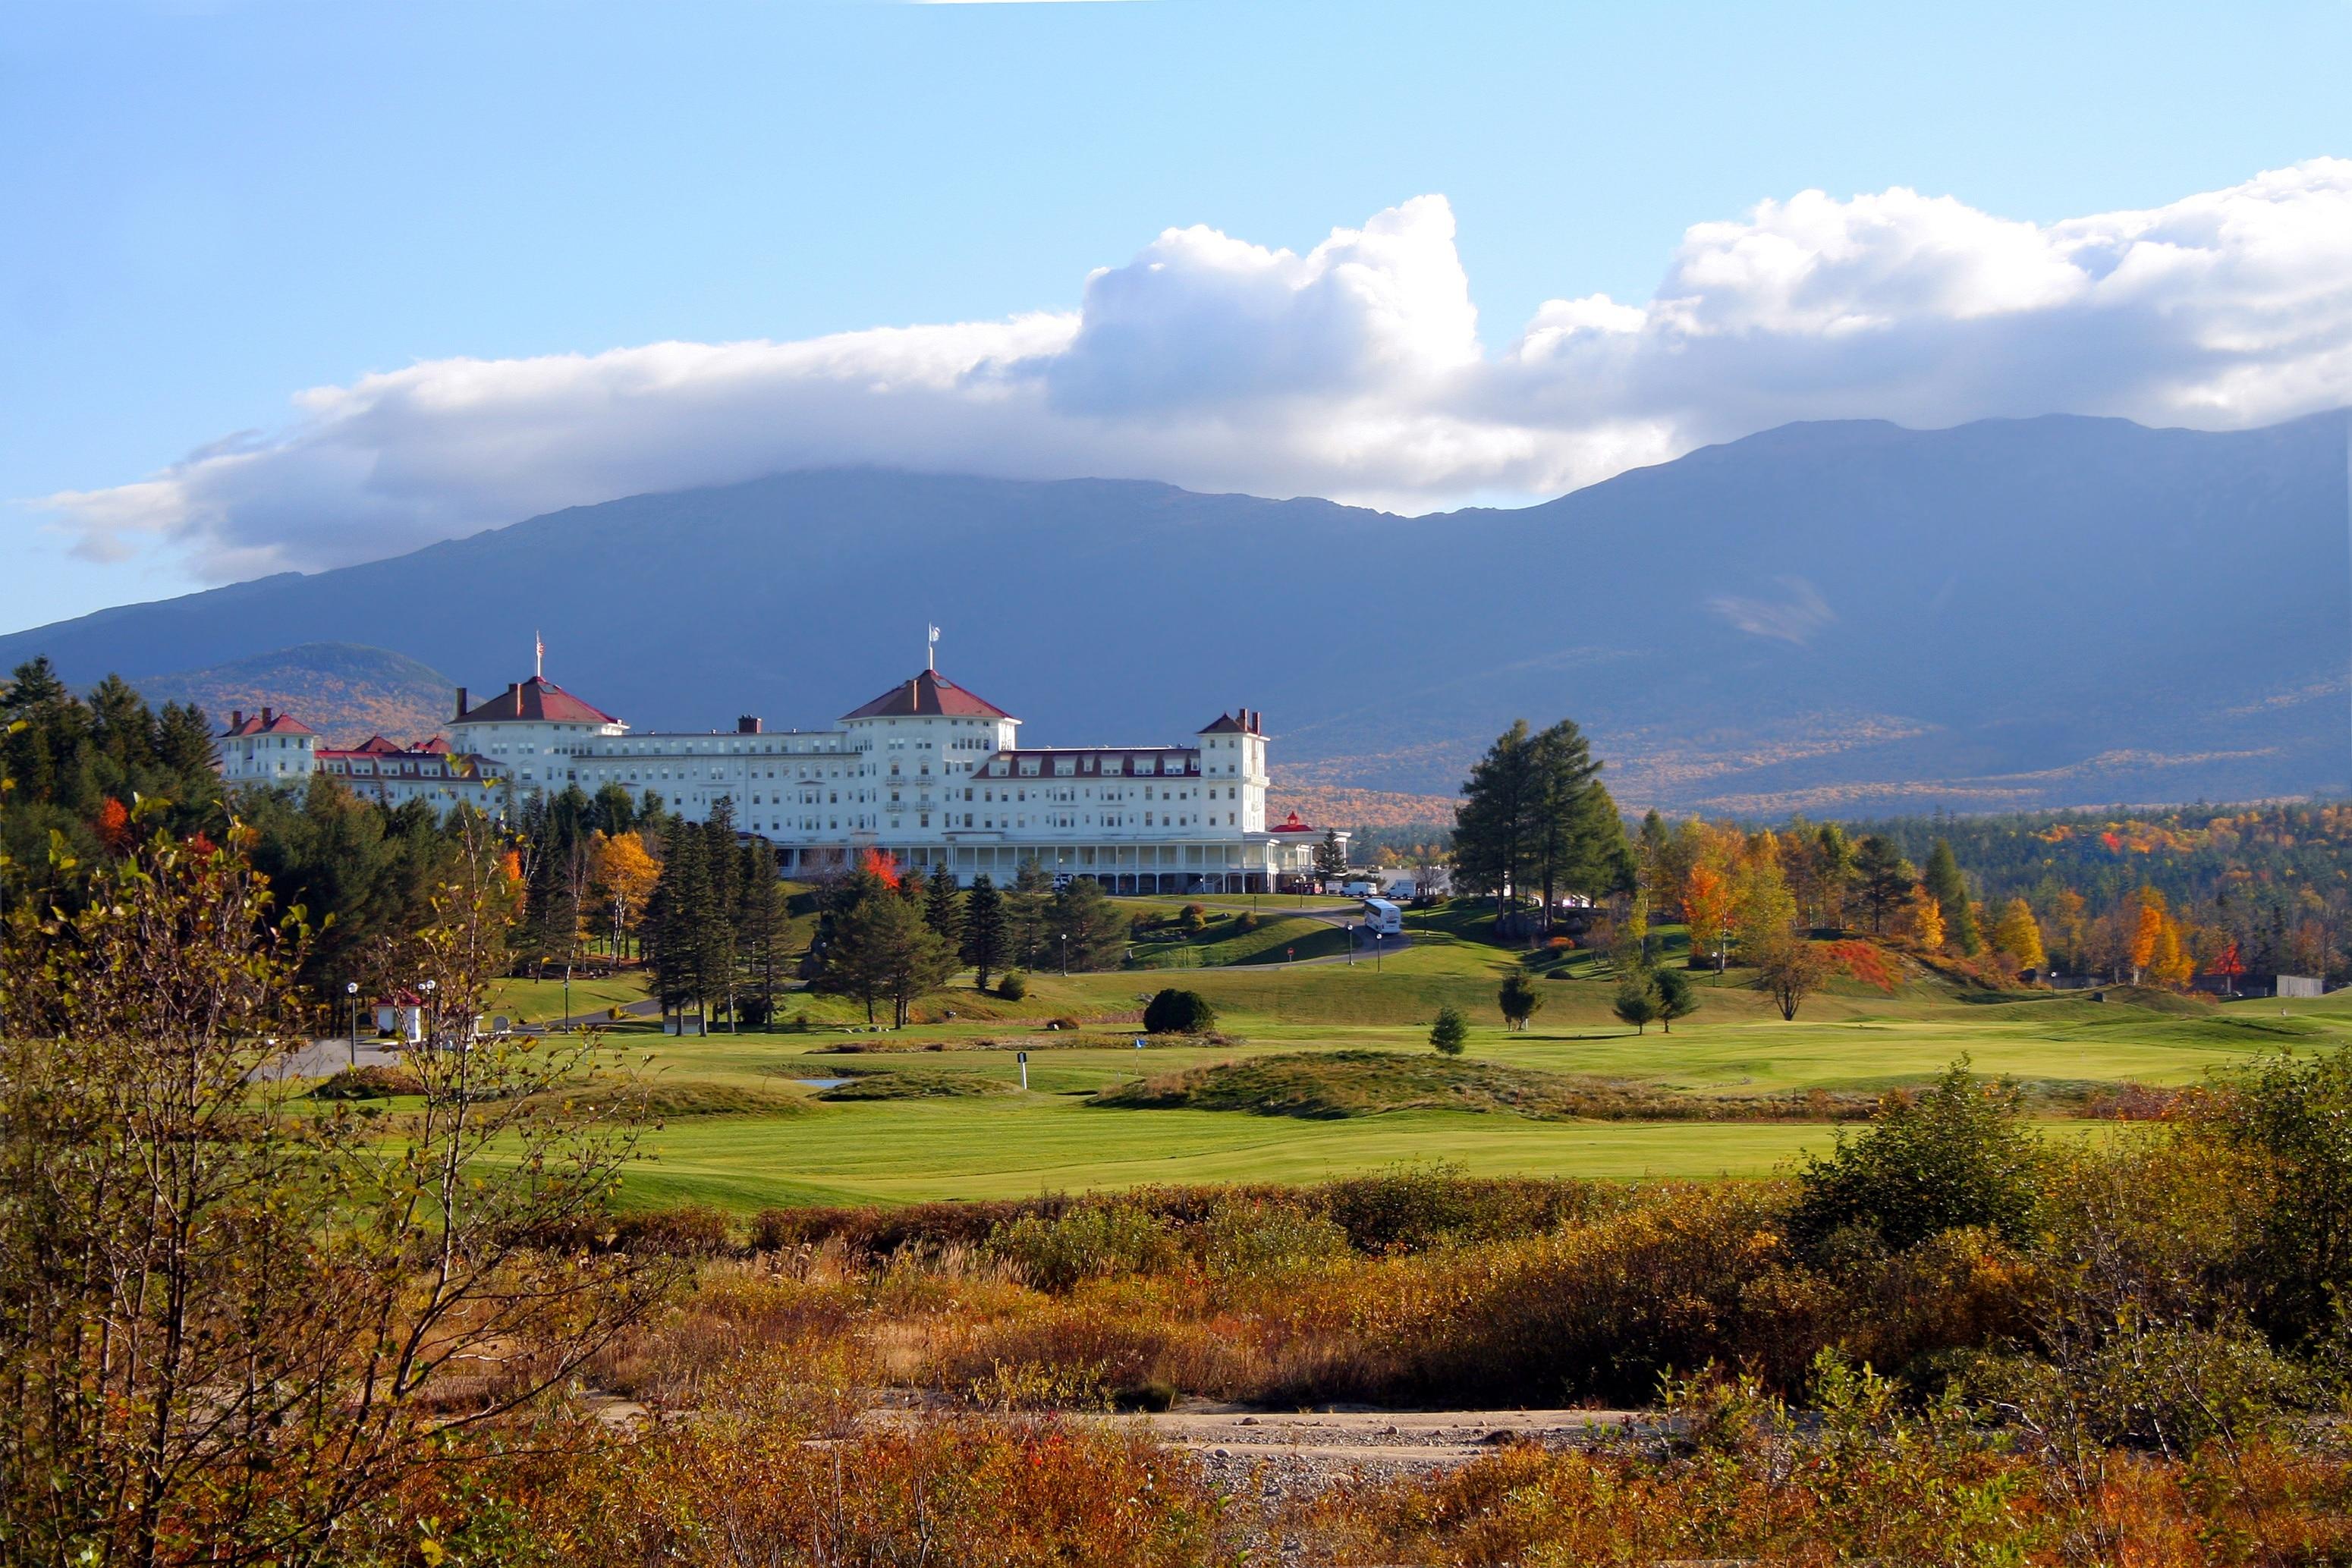 Bretton Woods, New Hampshire, United States of America